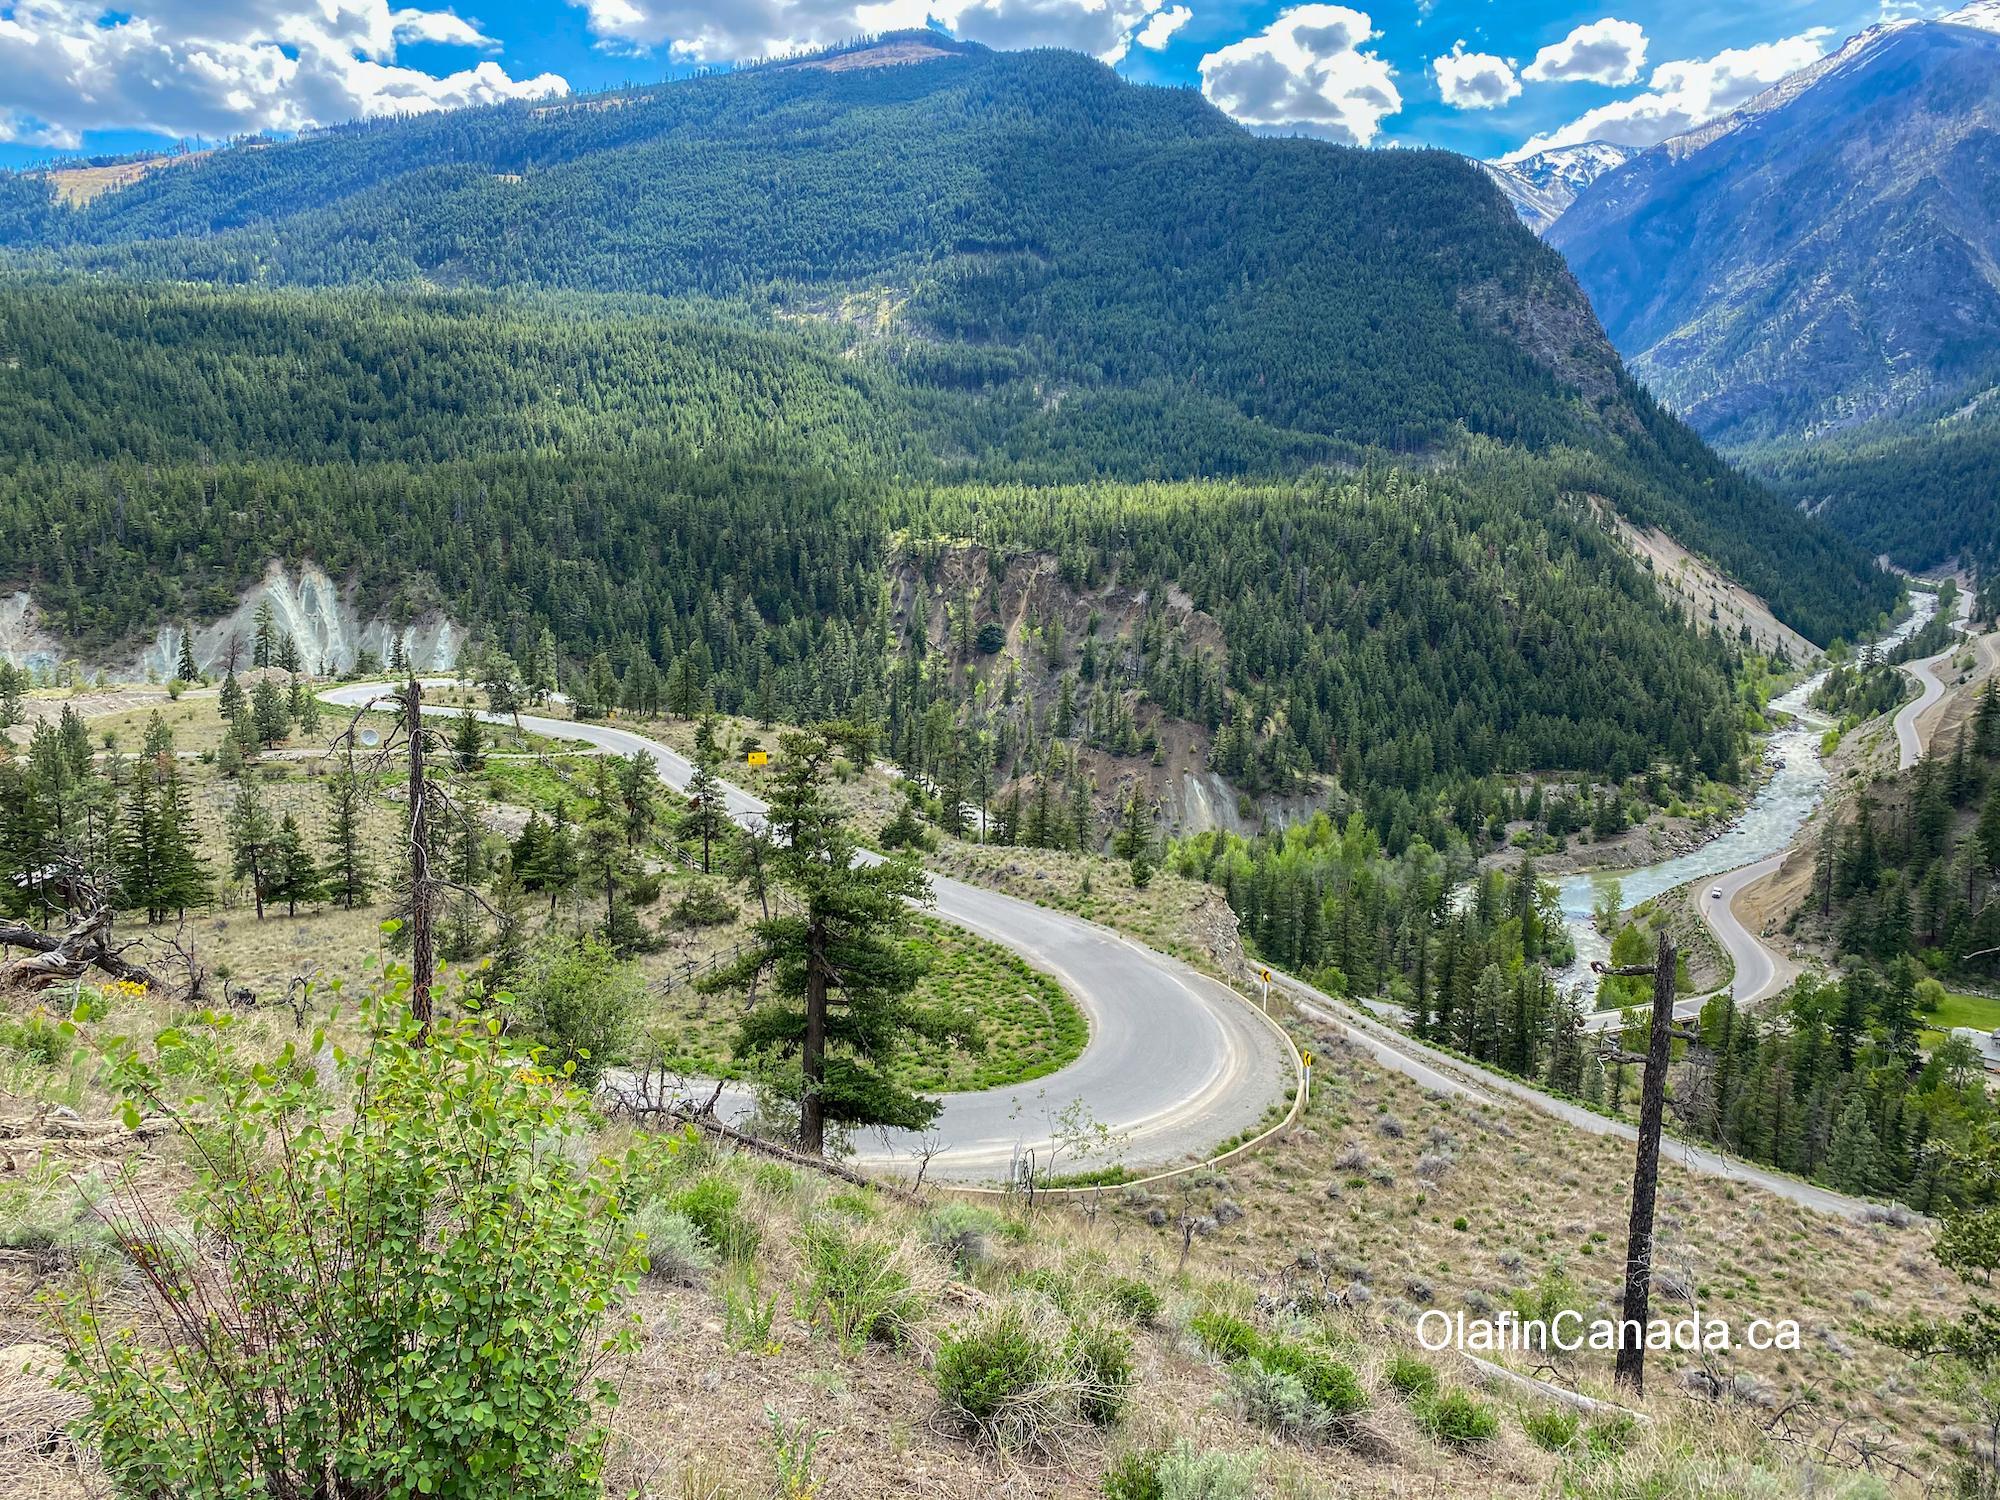 Winding road towards Bradian, near Carpenter Lake #olafincanada #britishcolumbia #discoverbc #landscape #windingroad